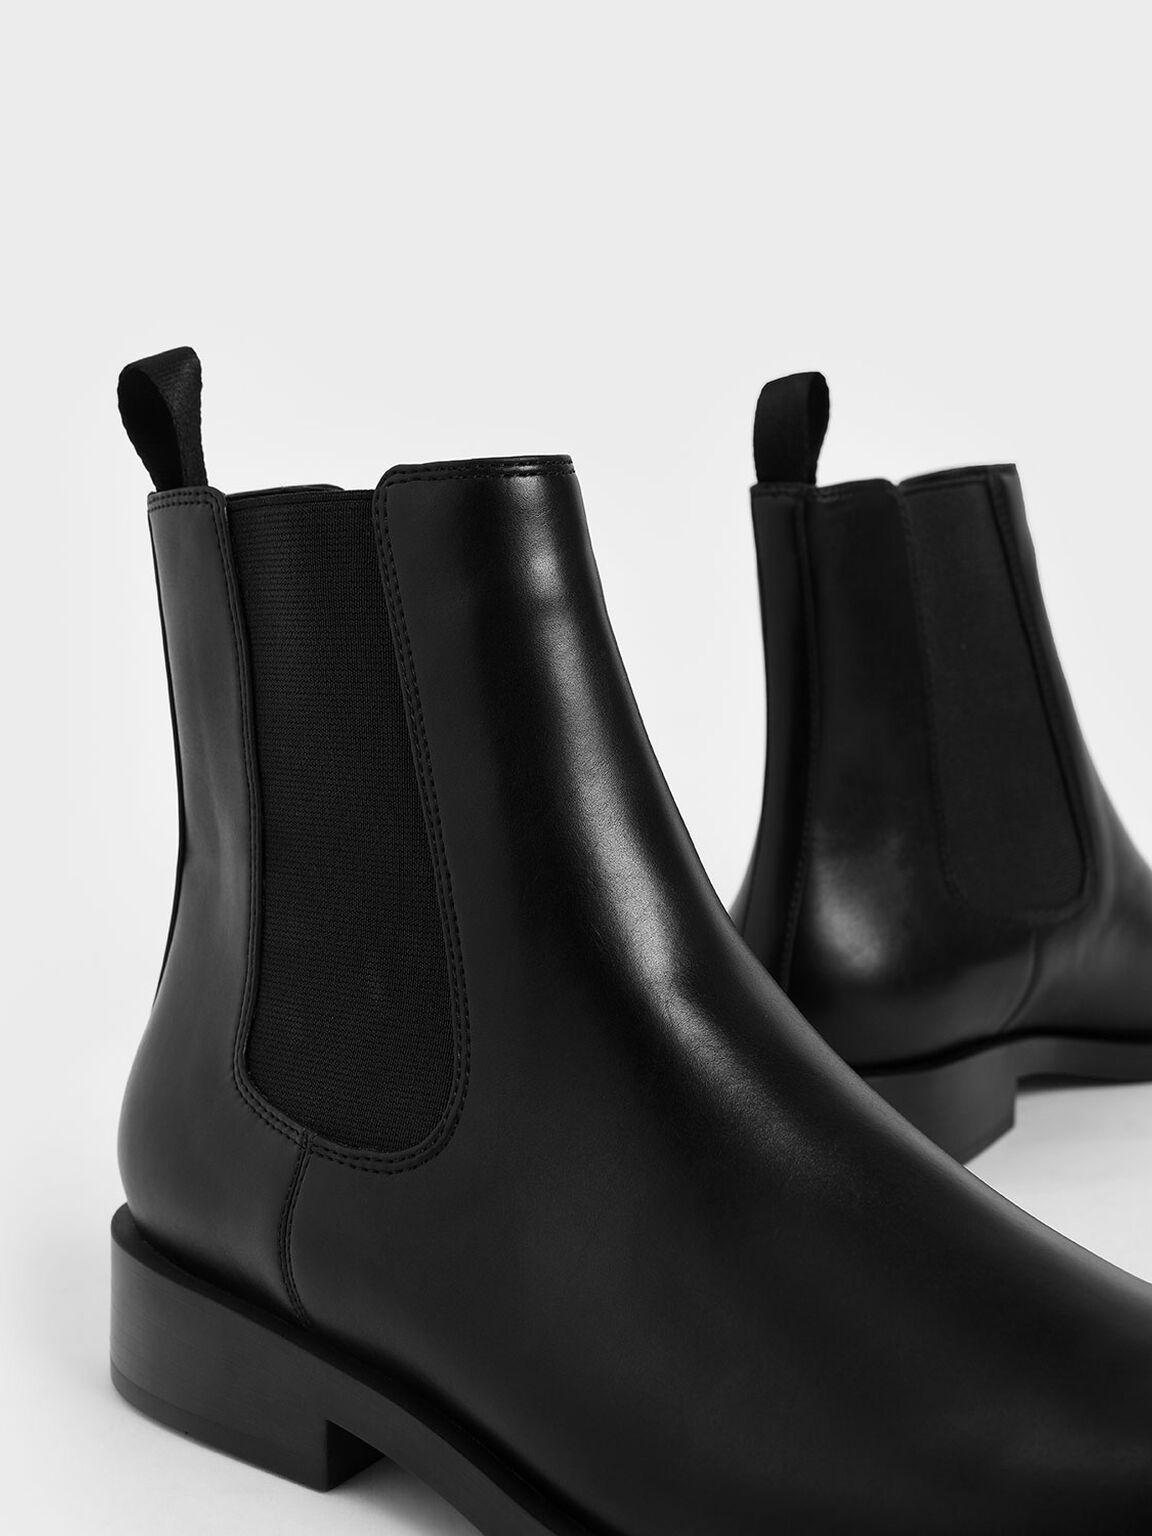 Round Toe Chelsea Boots, Black, hi-res